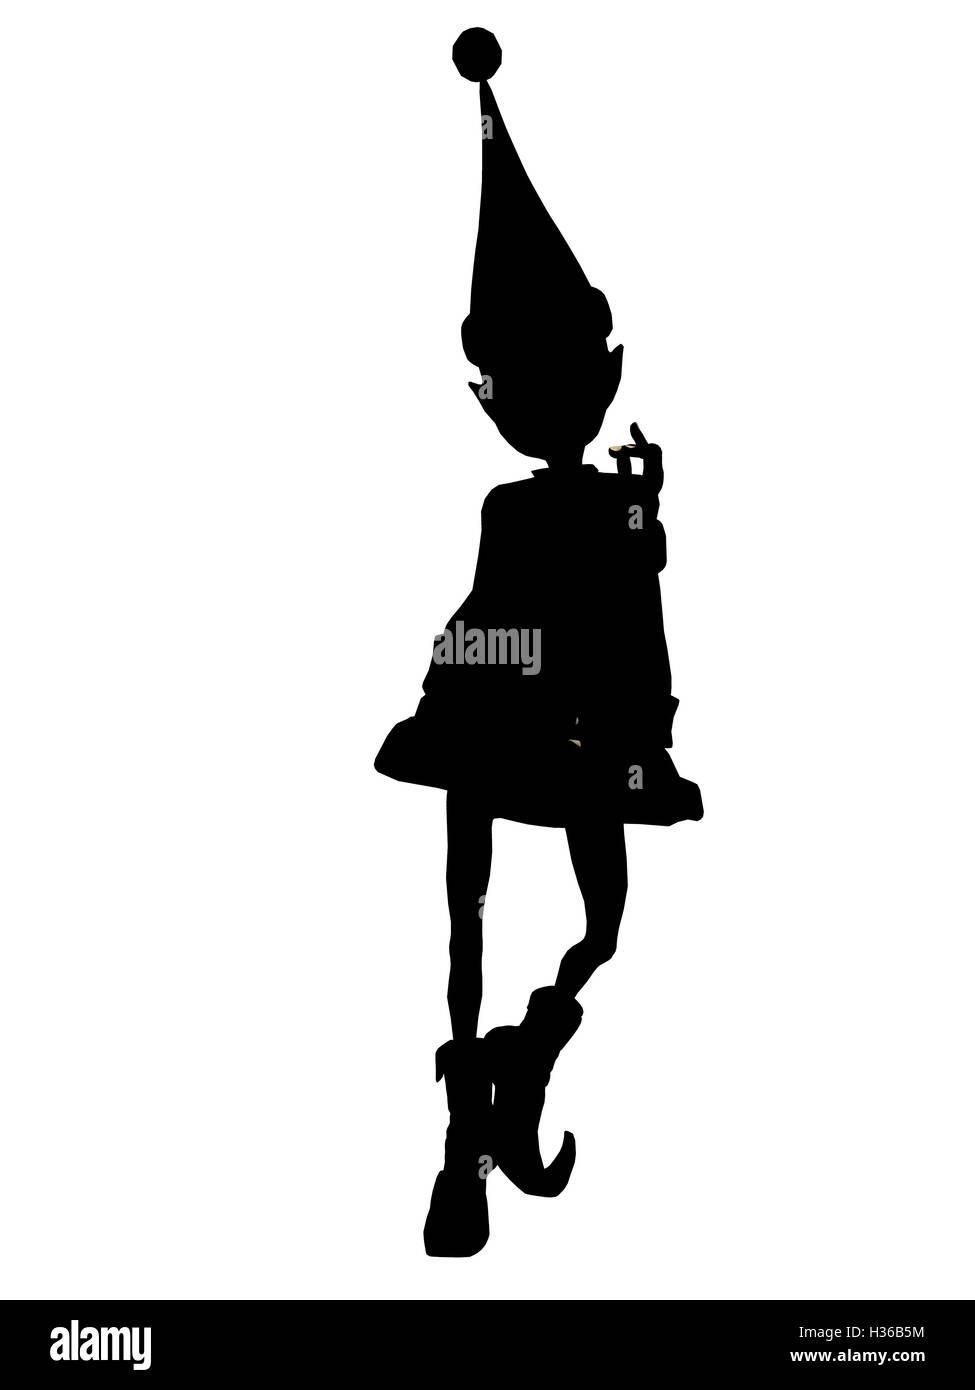 Christmas Elf Silhouette Illustration - Stock Image